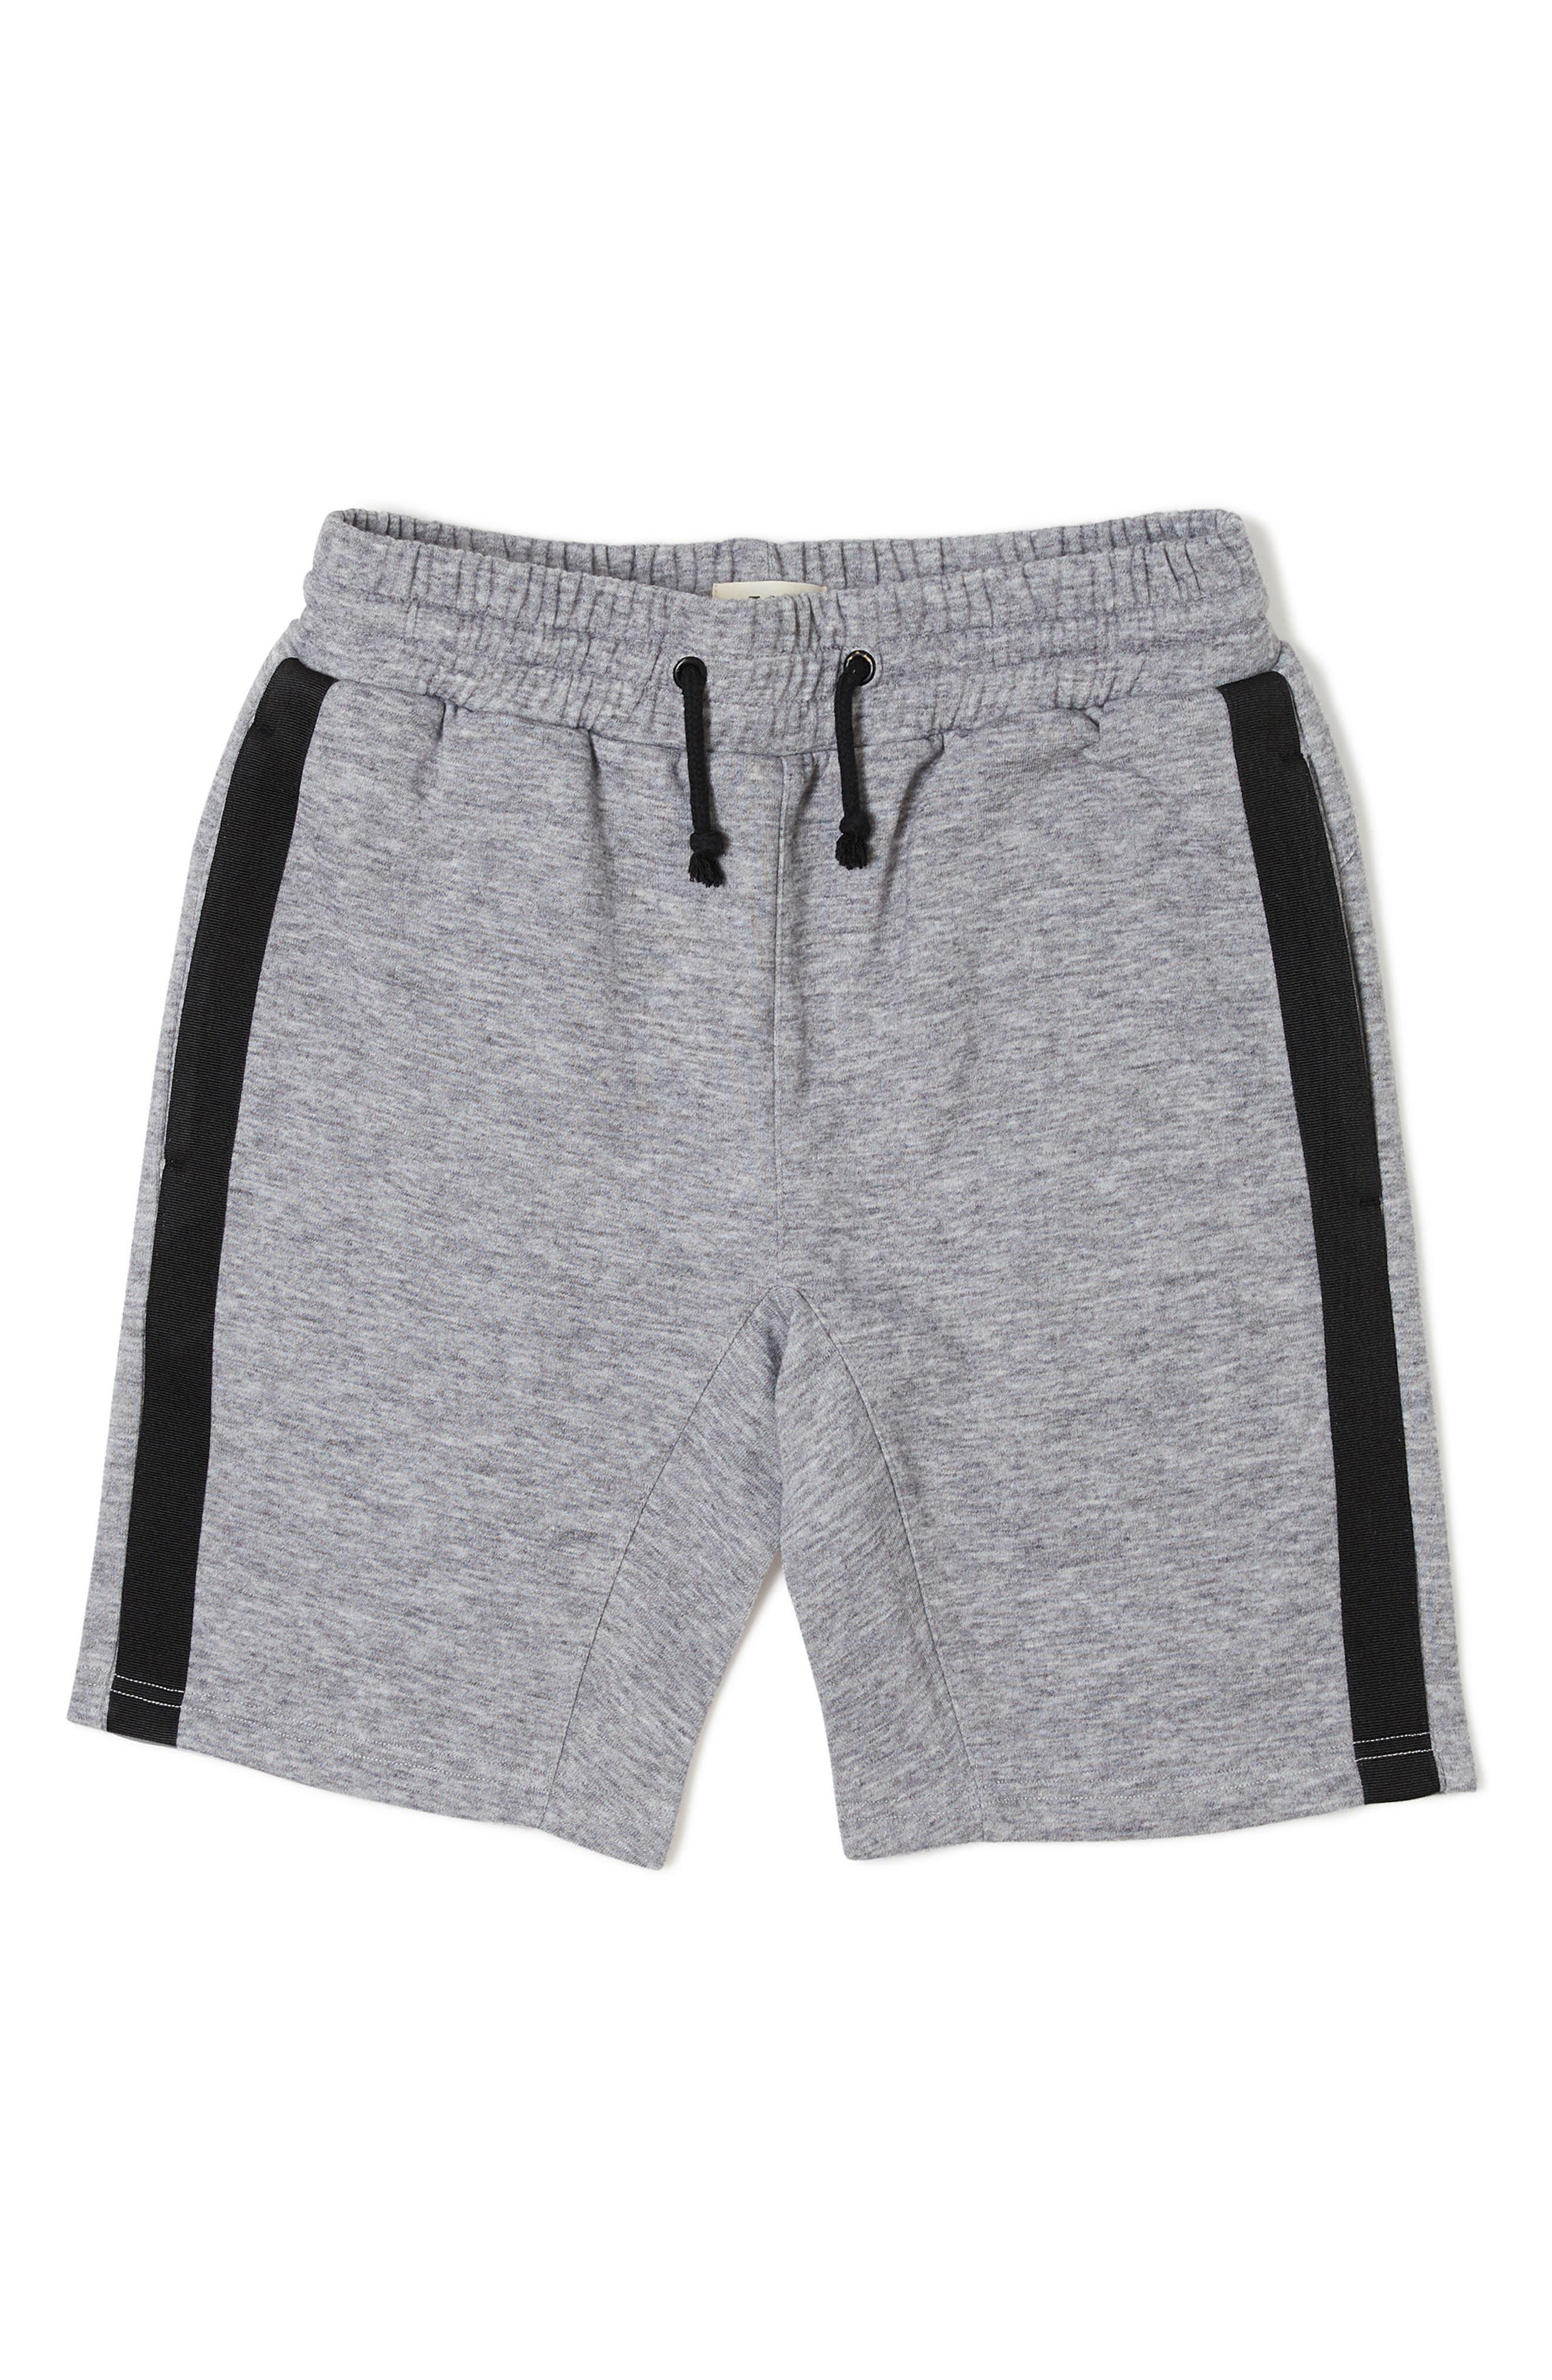 Rhett Knit Shorts,                             Main thumbnail 1, color,                             HEATHER GREY